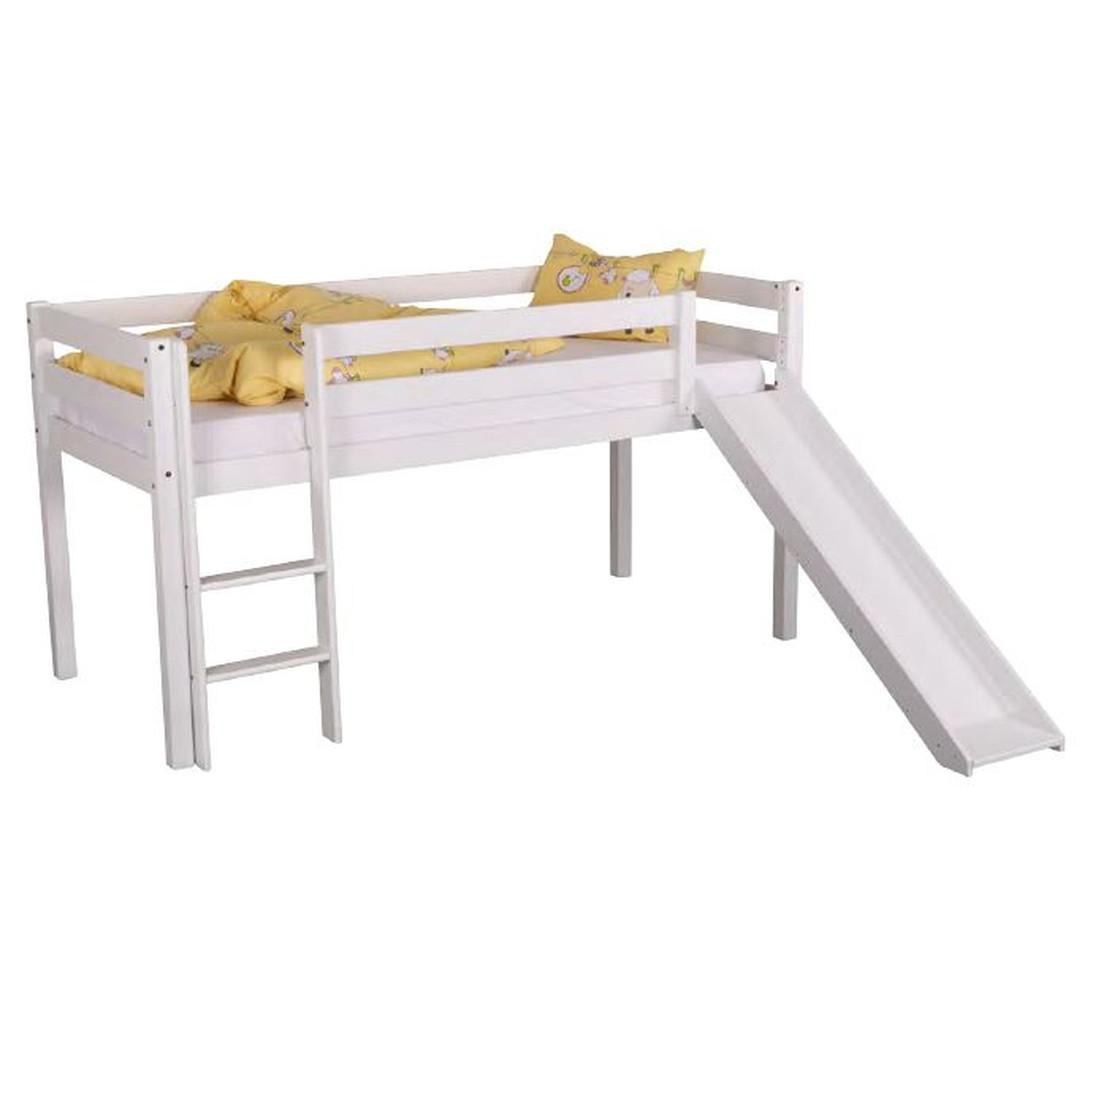 Full Size of Halbhohes Massivholzbett Hochbett Kinderbett Toni Mit Rutsche Bett Wohnzimmer Halbhohes Hochbett